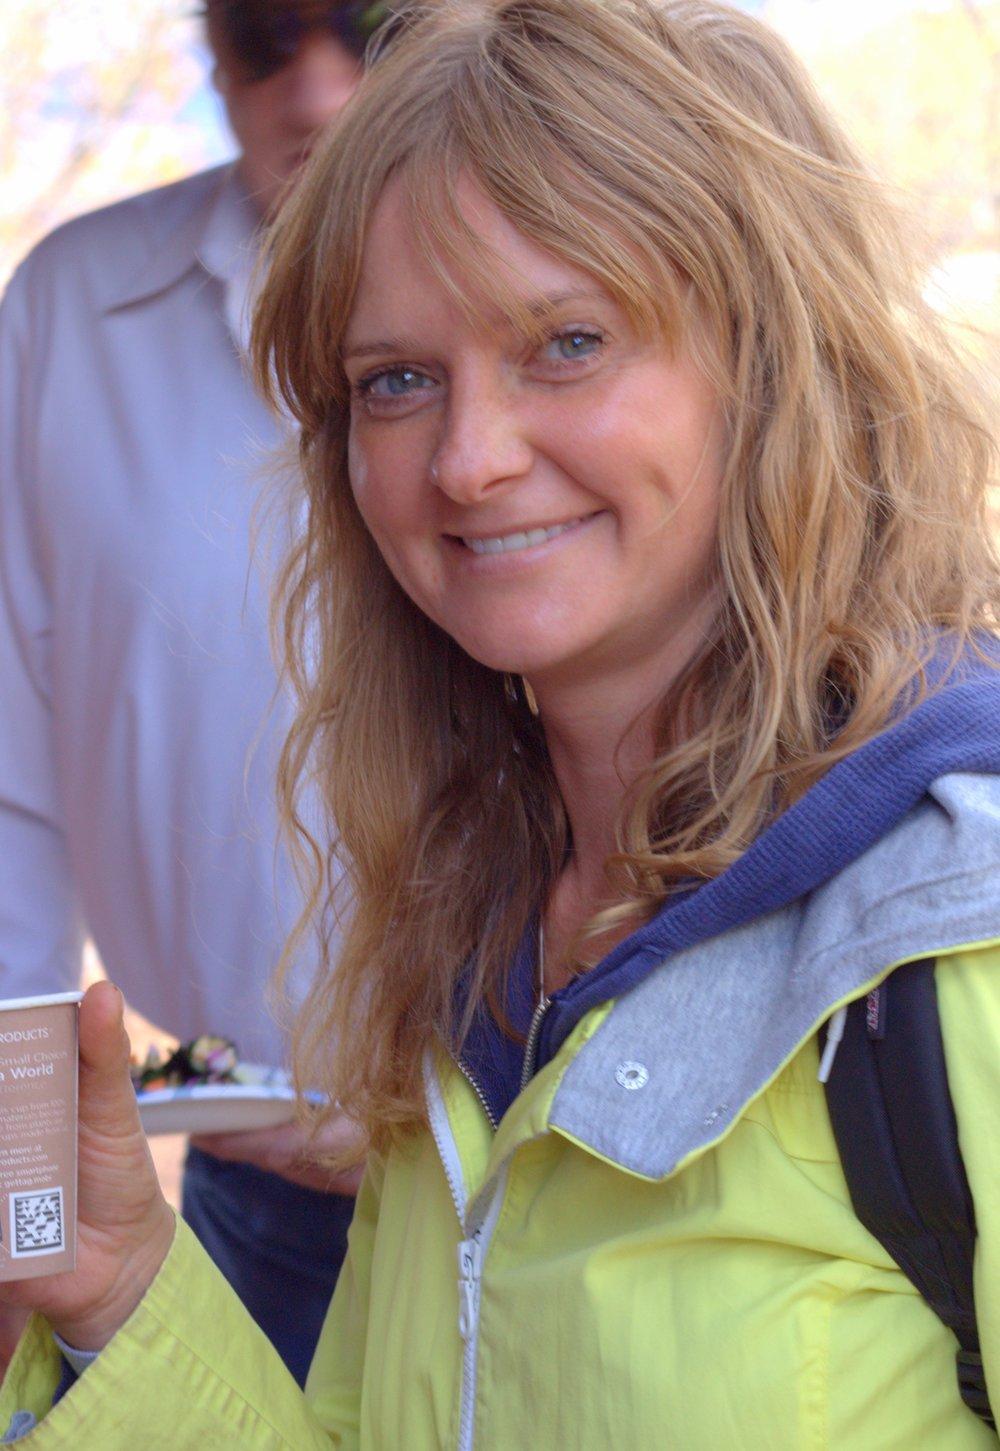 Elena Skroznikova Nutrition Counselor